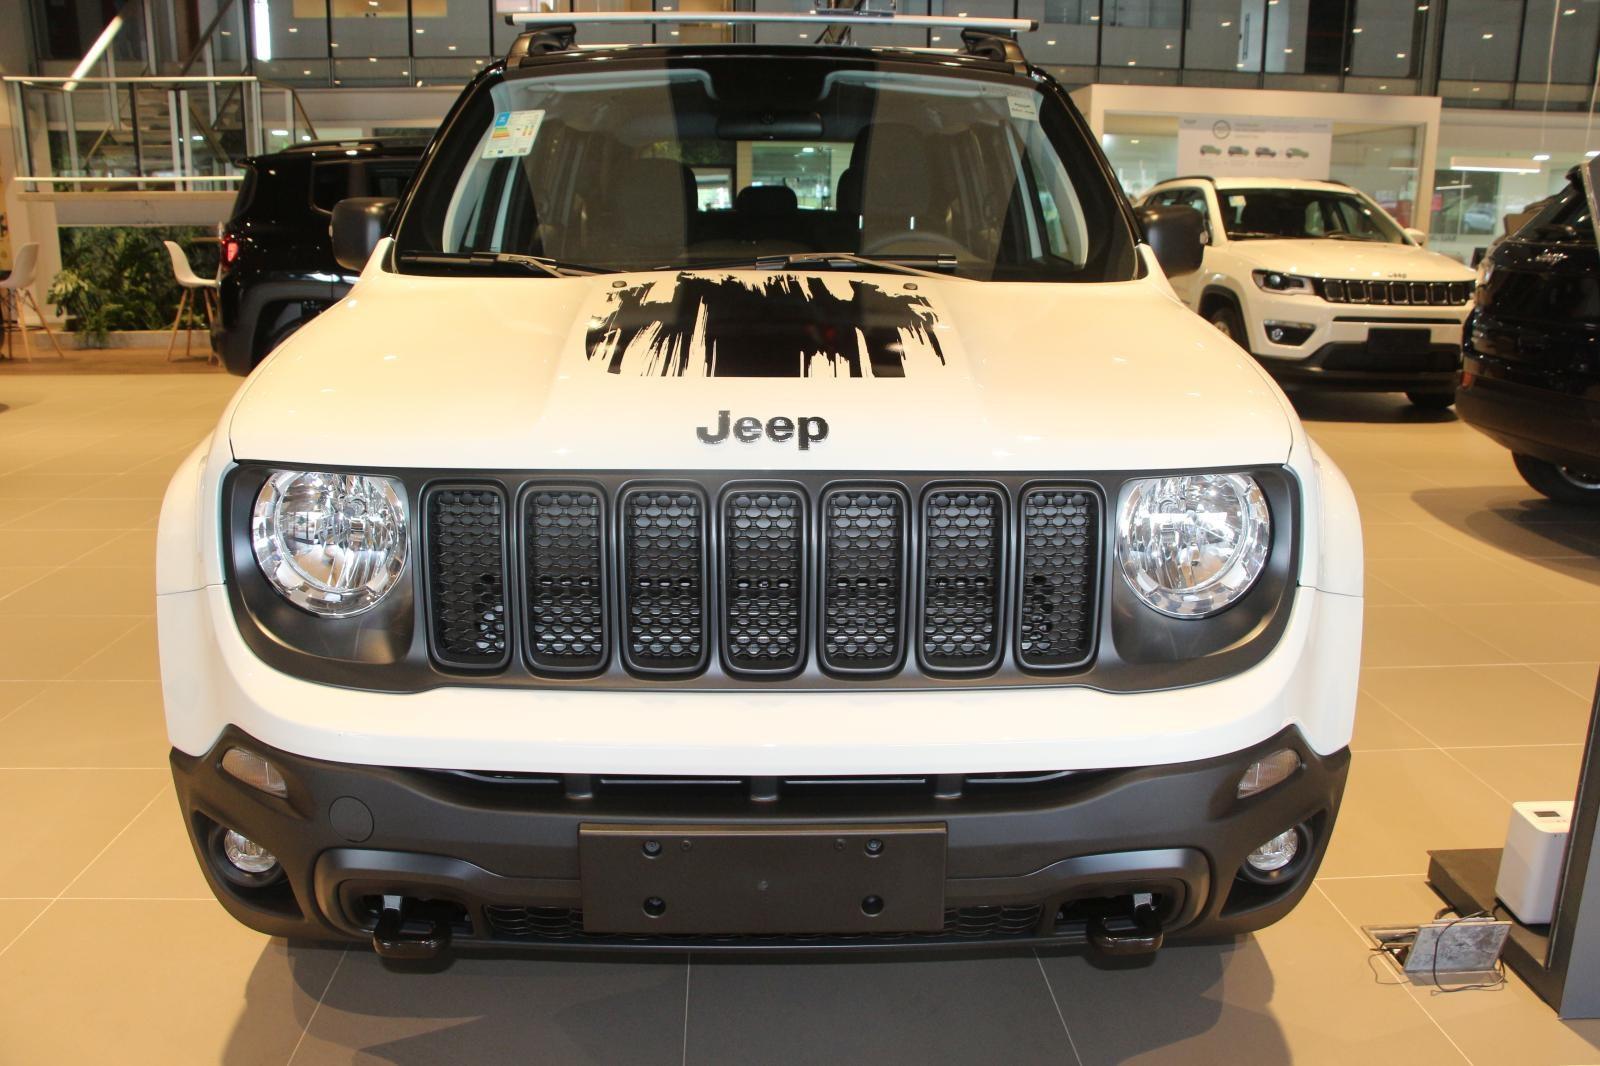 //www.autoline.com.br/carro/jeep/renegade-20-moab-16v-diesel-4p-4x4-turbo-automatico/2021/brasilia-df/14839648